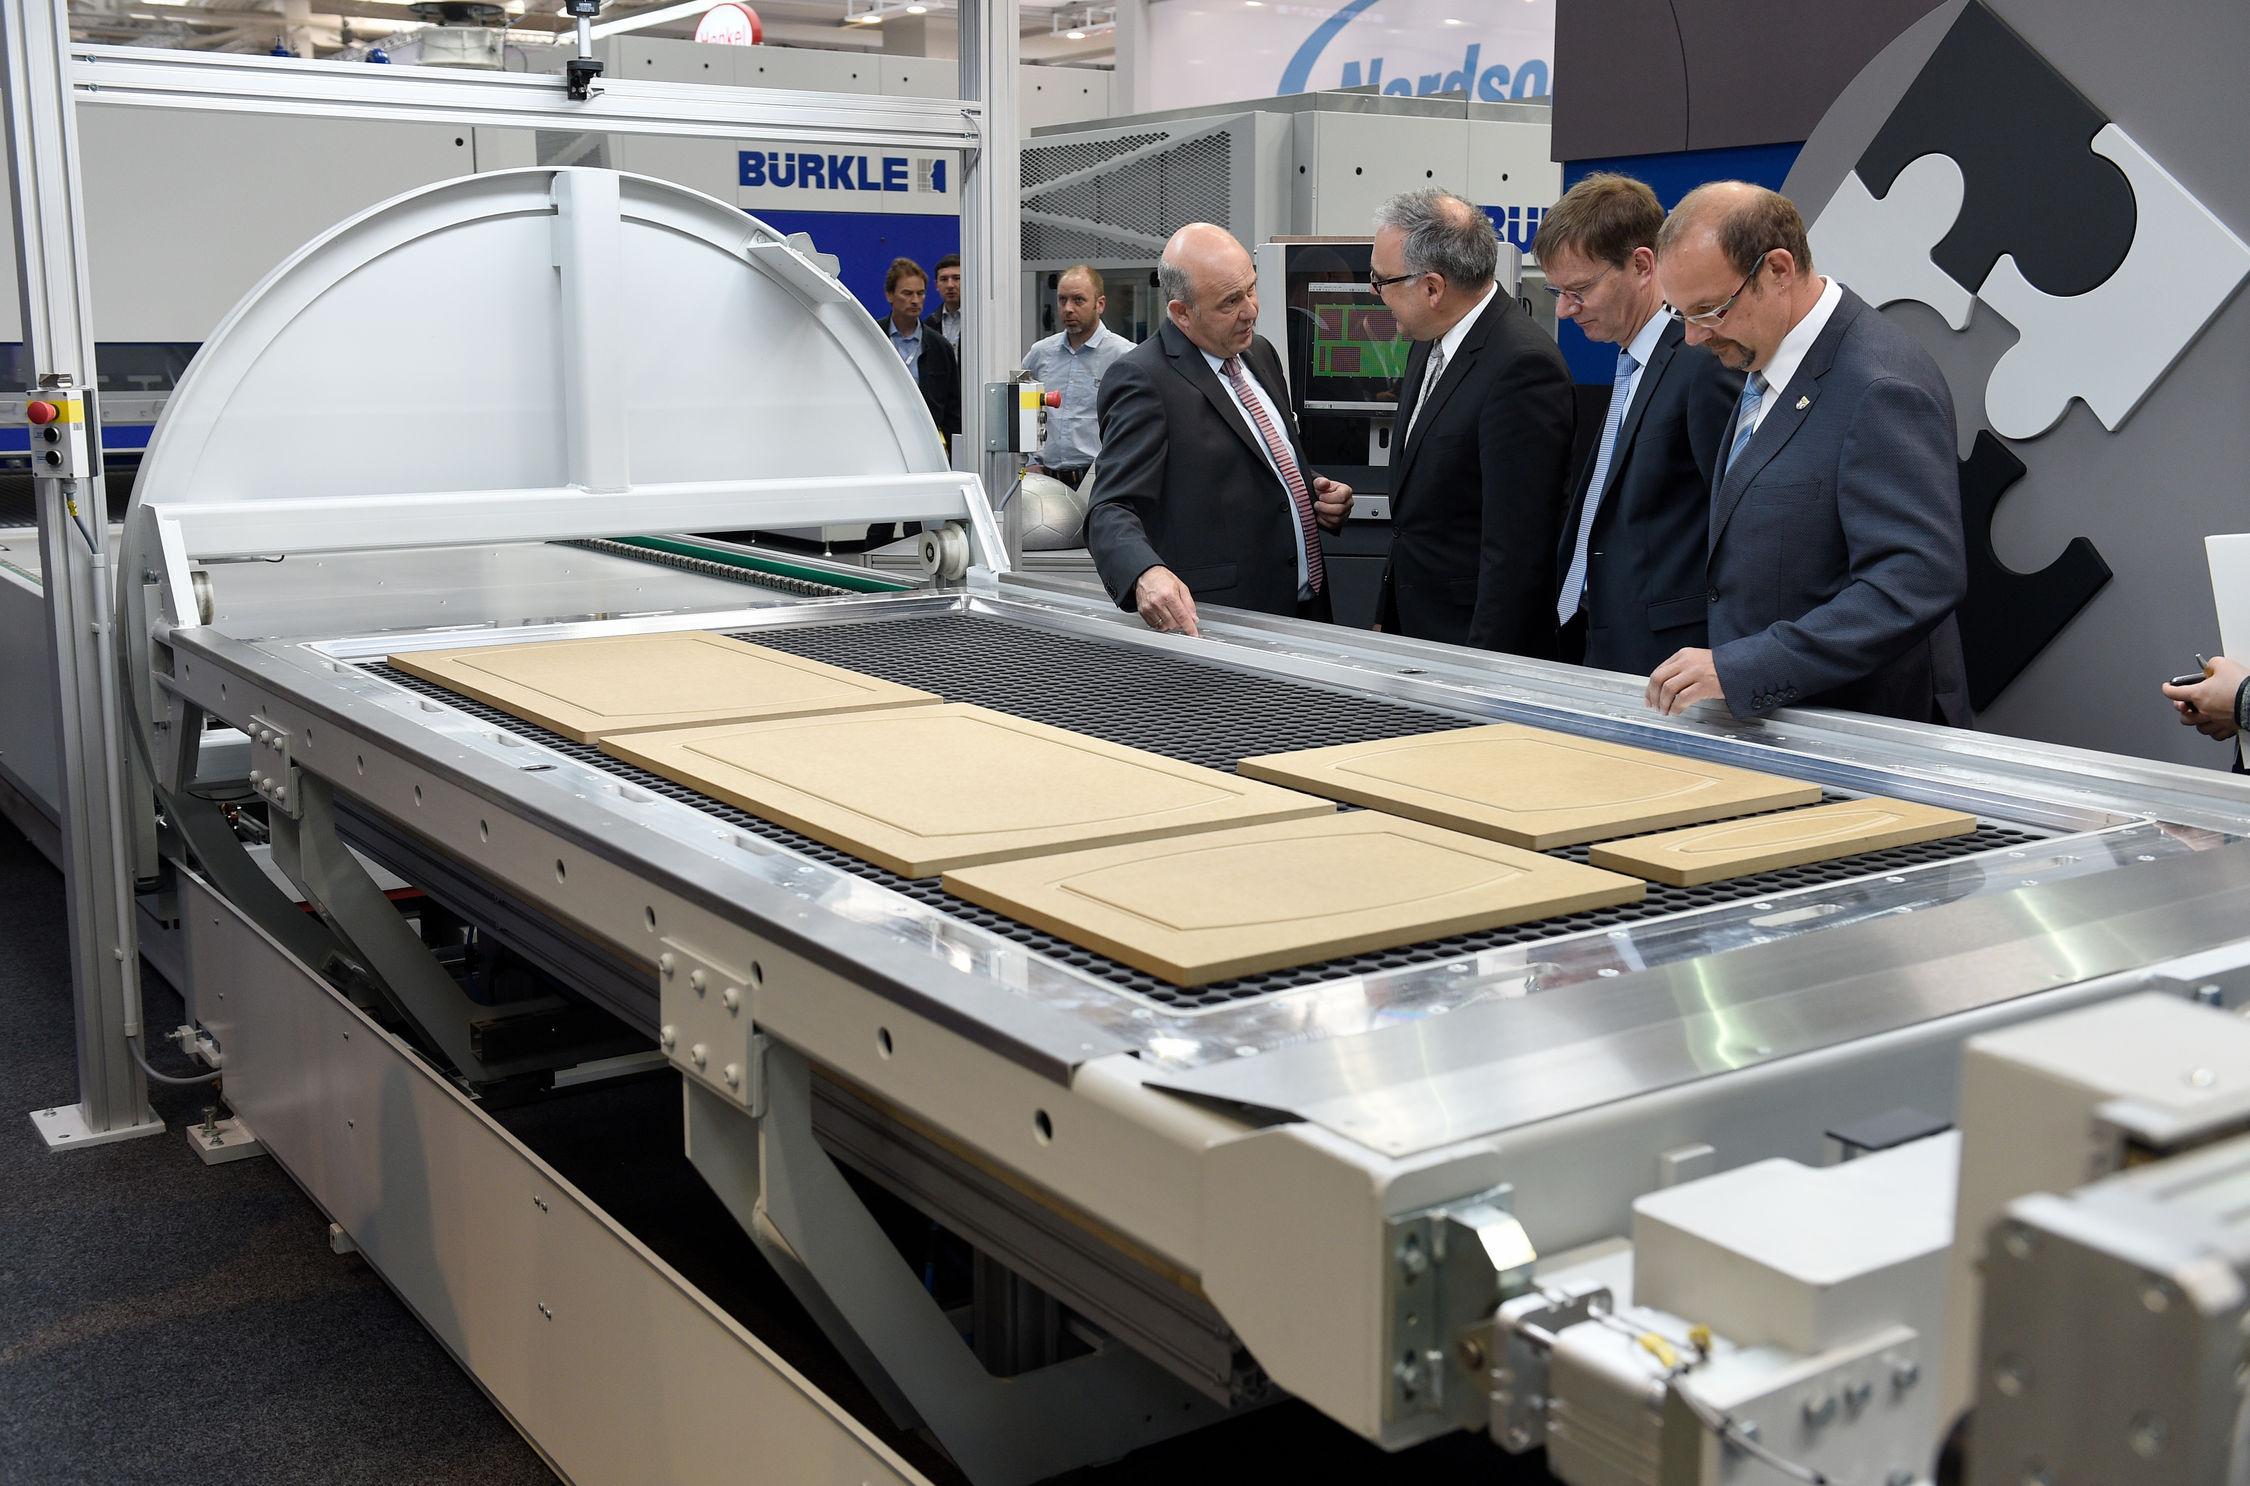 LIGNA 2019 smart surface technology